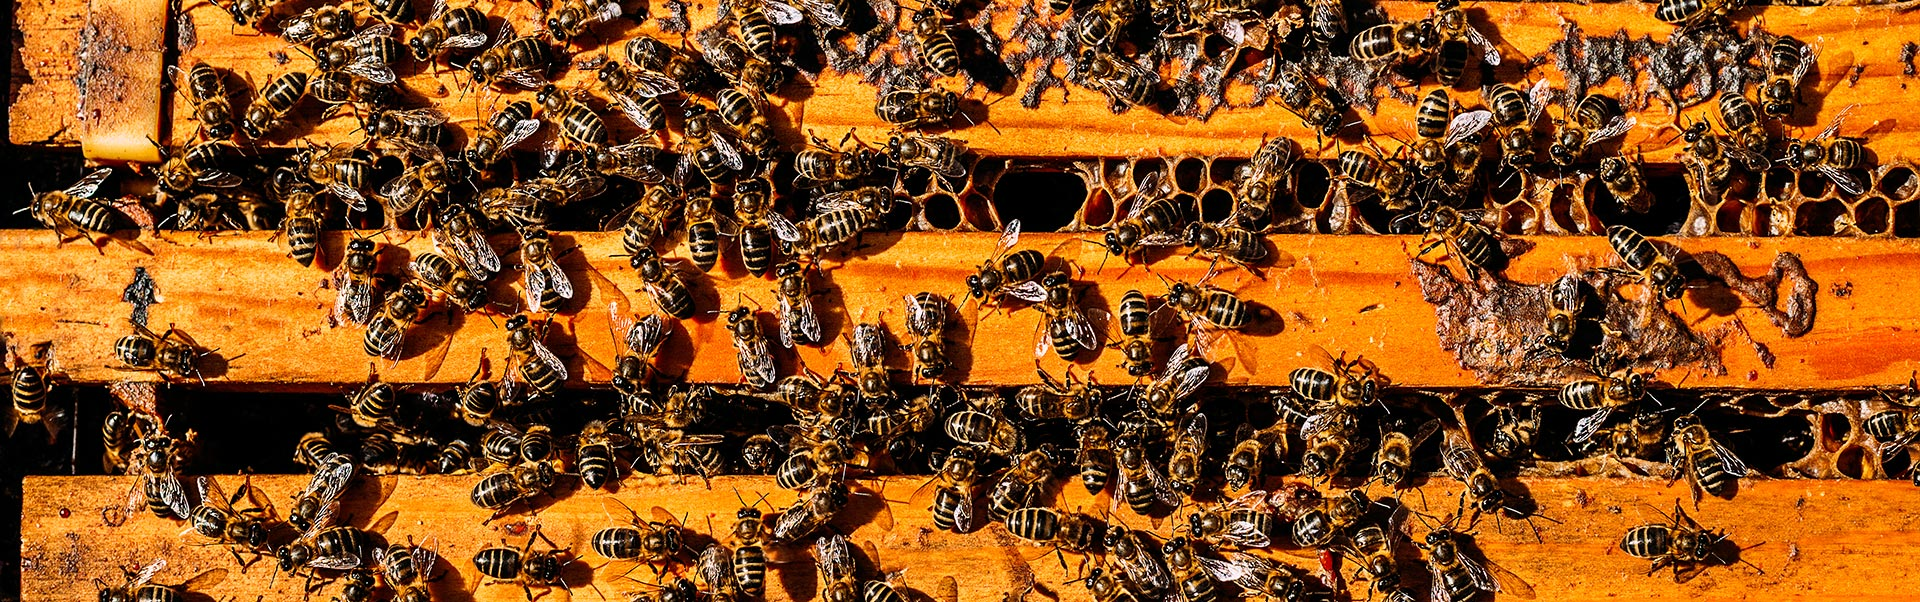 close-up-of-bees-on-honeycomb-TYK3KU7_web